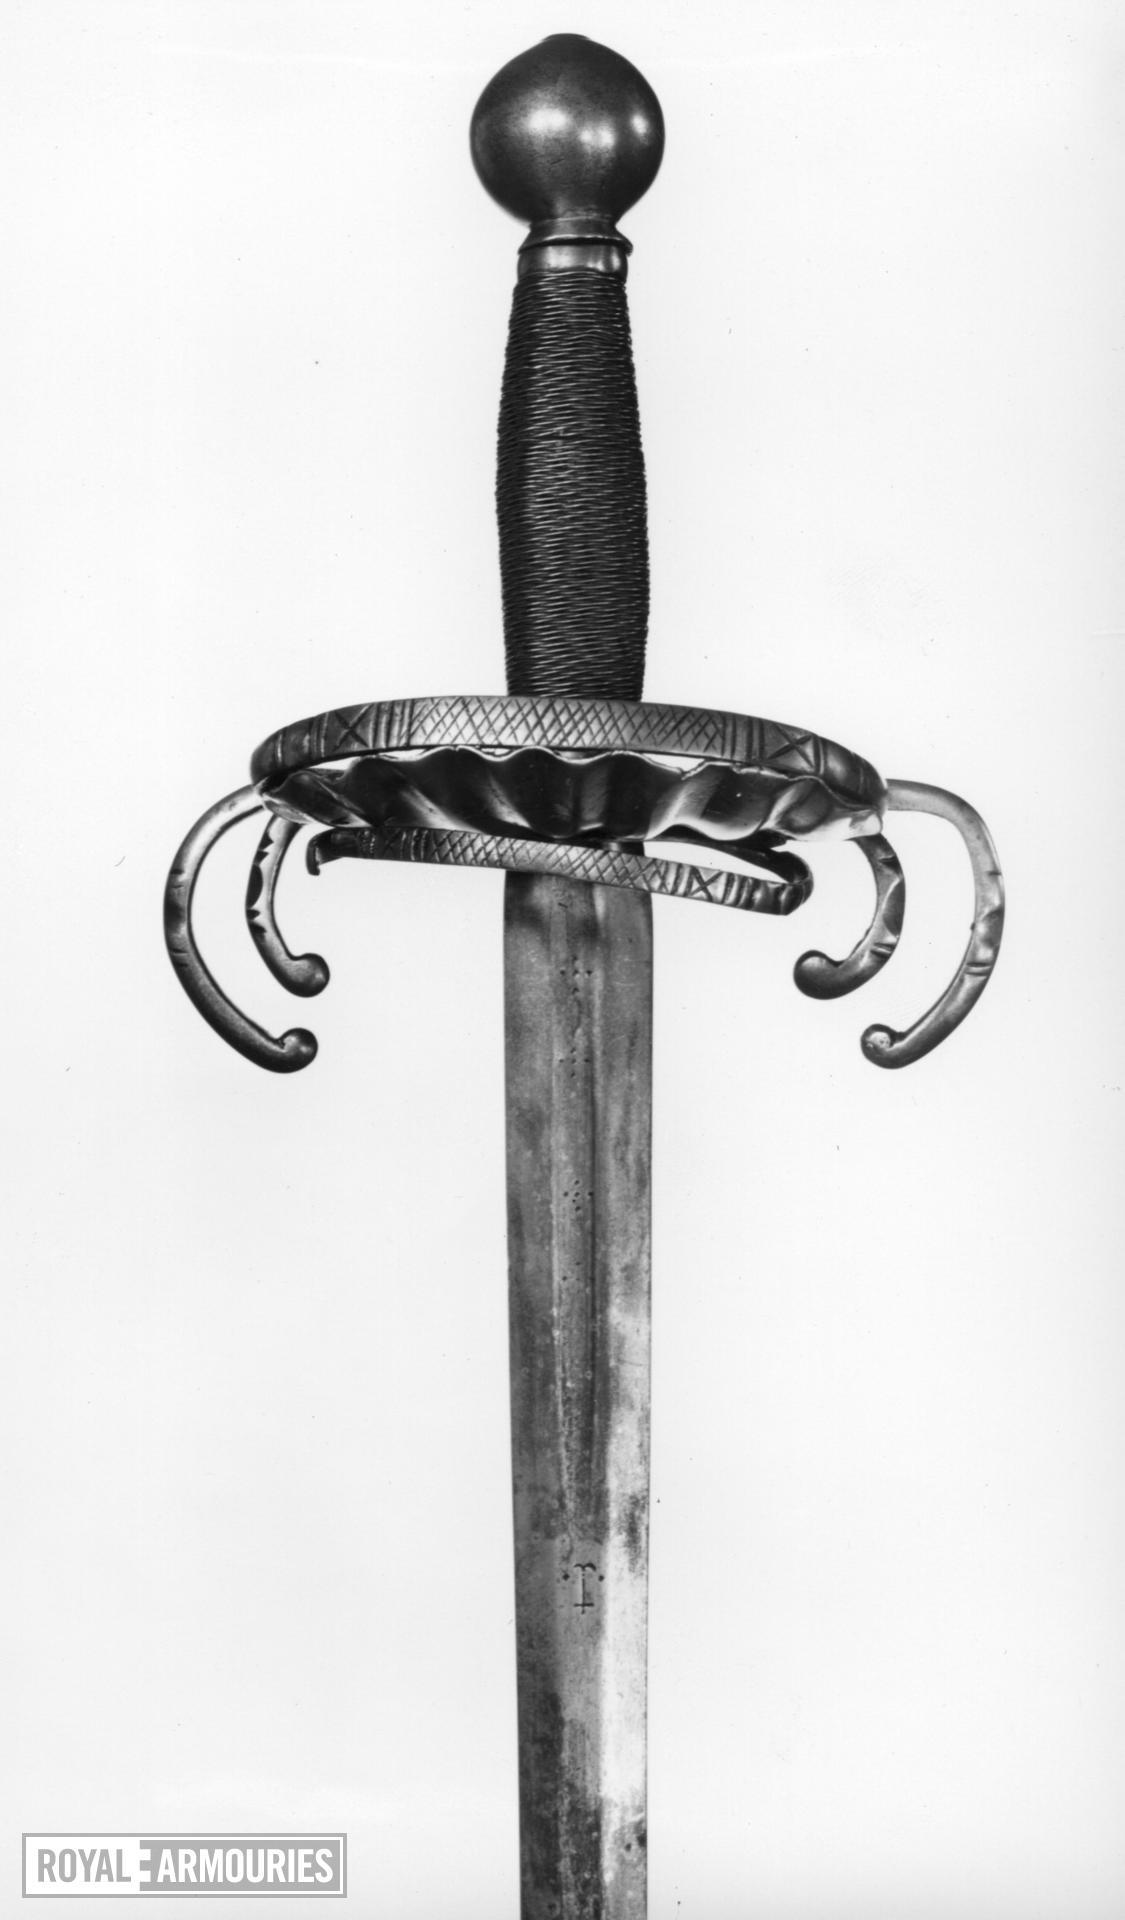 Sword Crab hilted sword